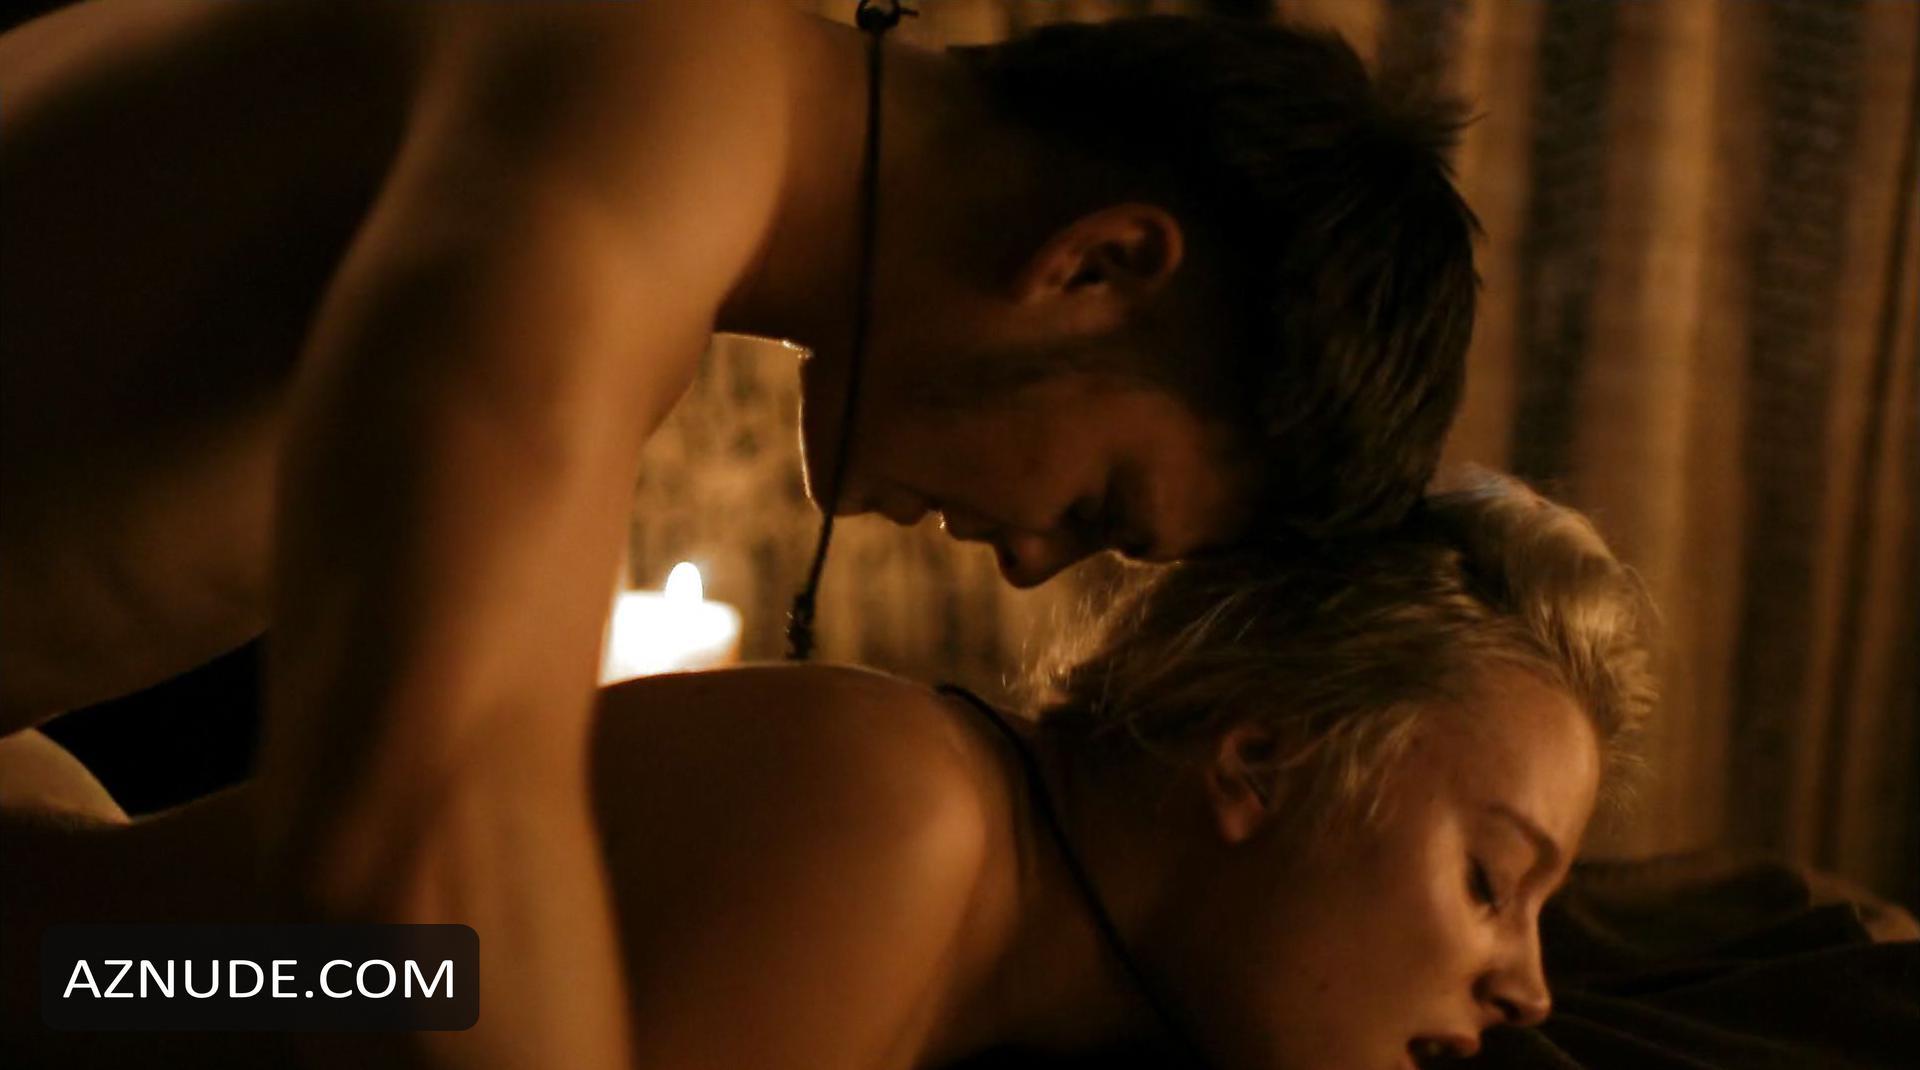 image Dagny backer nude sex scene vikings on scandalplanetcom